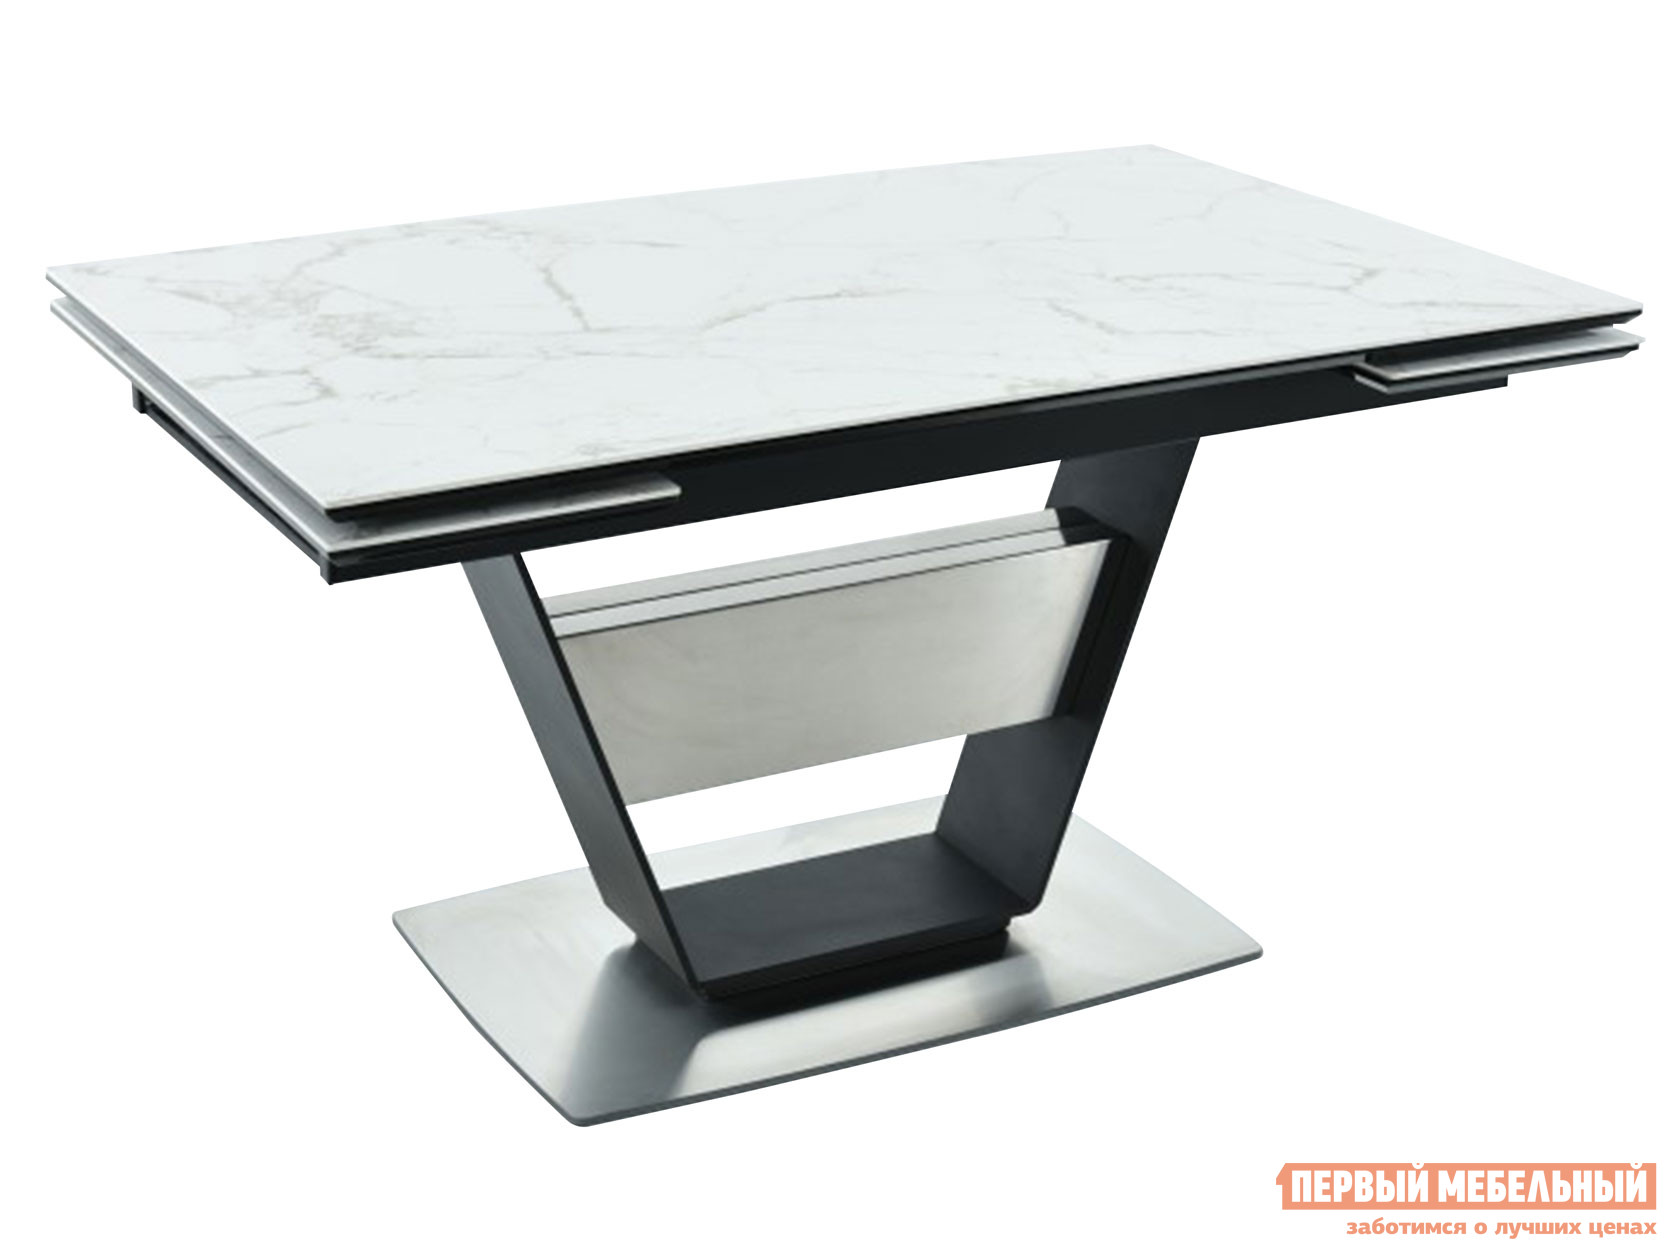 Кухонный стол  Мальта Calacata vagli / Черный, металл Мебвилл 127371